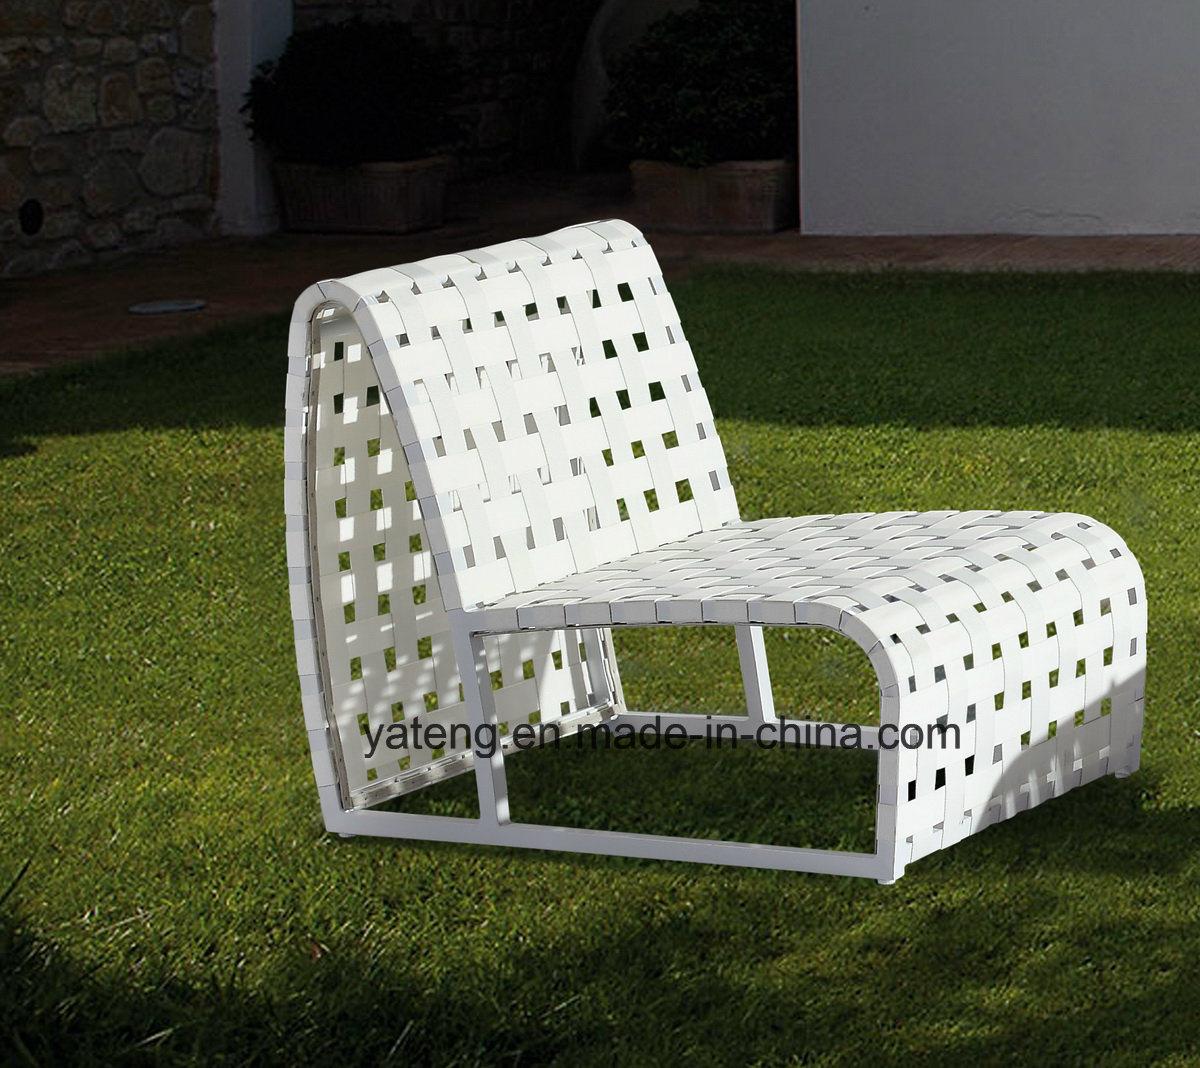 Simple Design Euro Popular Outdoor Patio Sofa Set with Rope &Aluminum Frame (YT996)